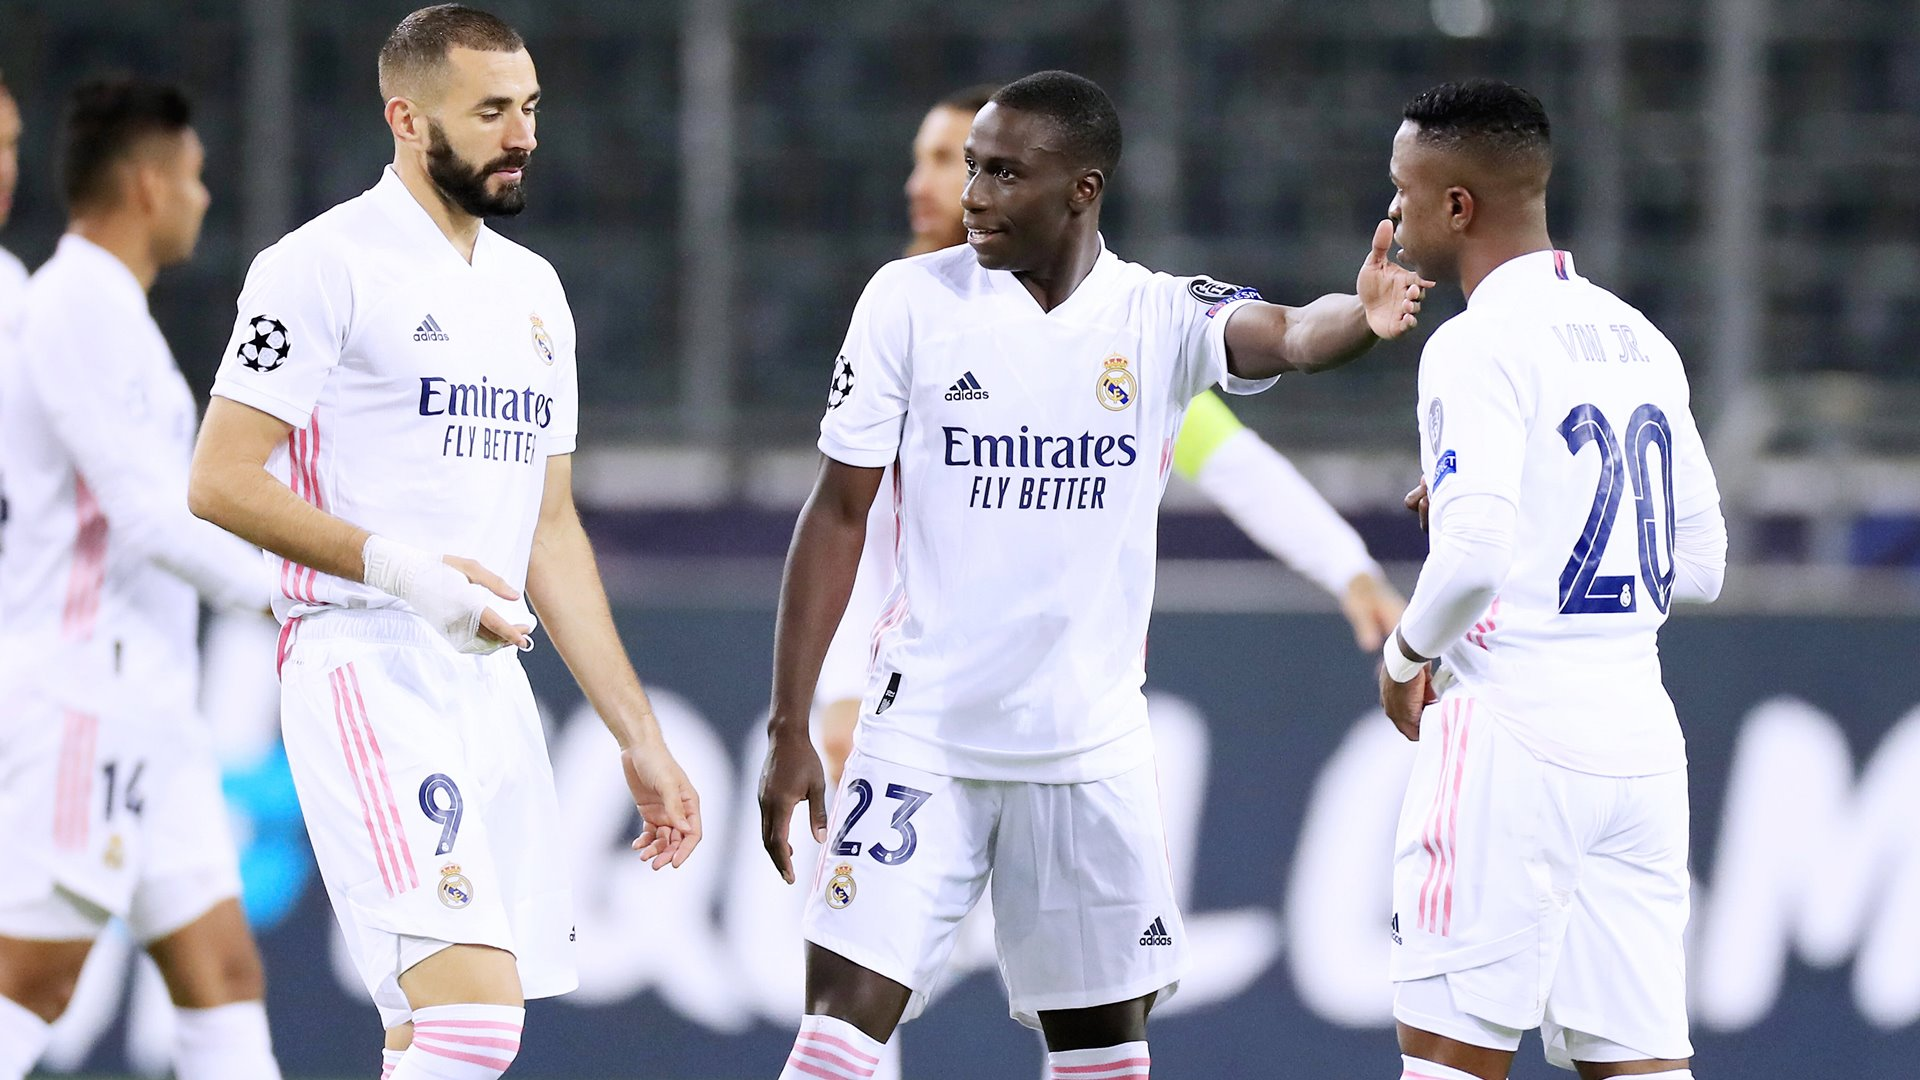 Champions League, Real Madrid, Karim Benzema